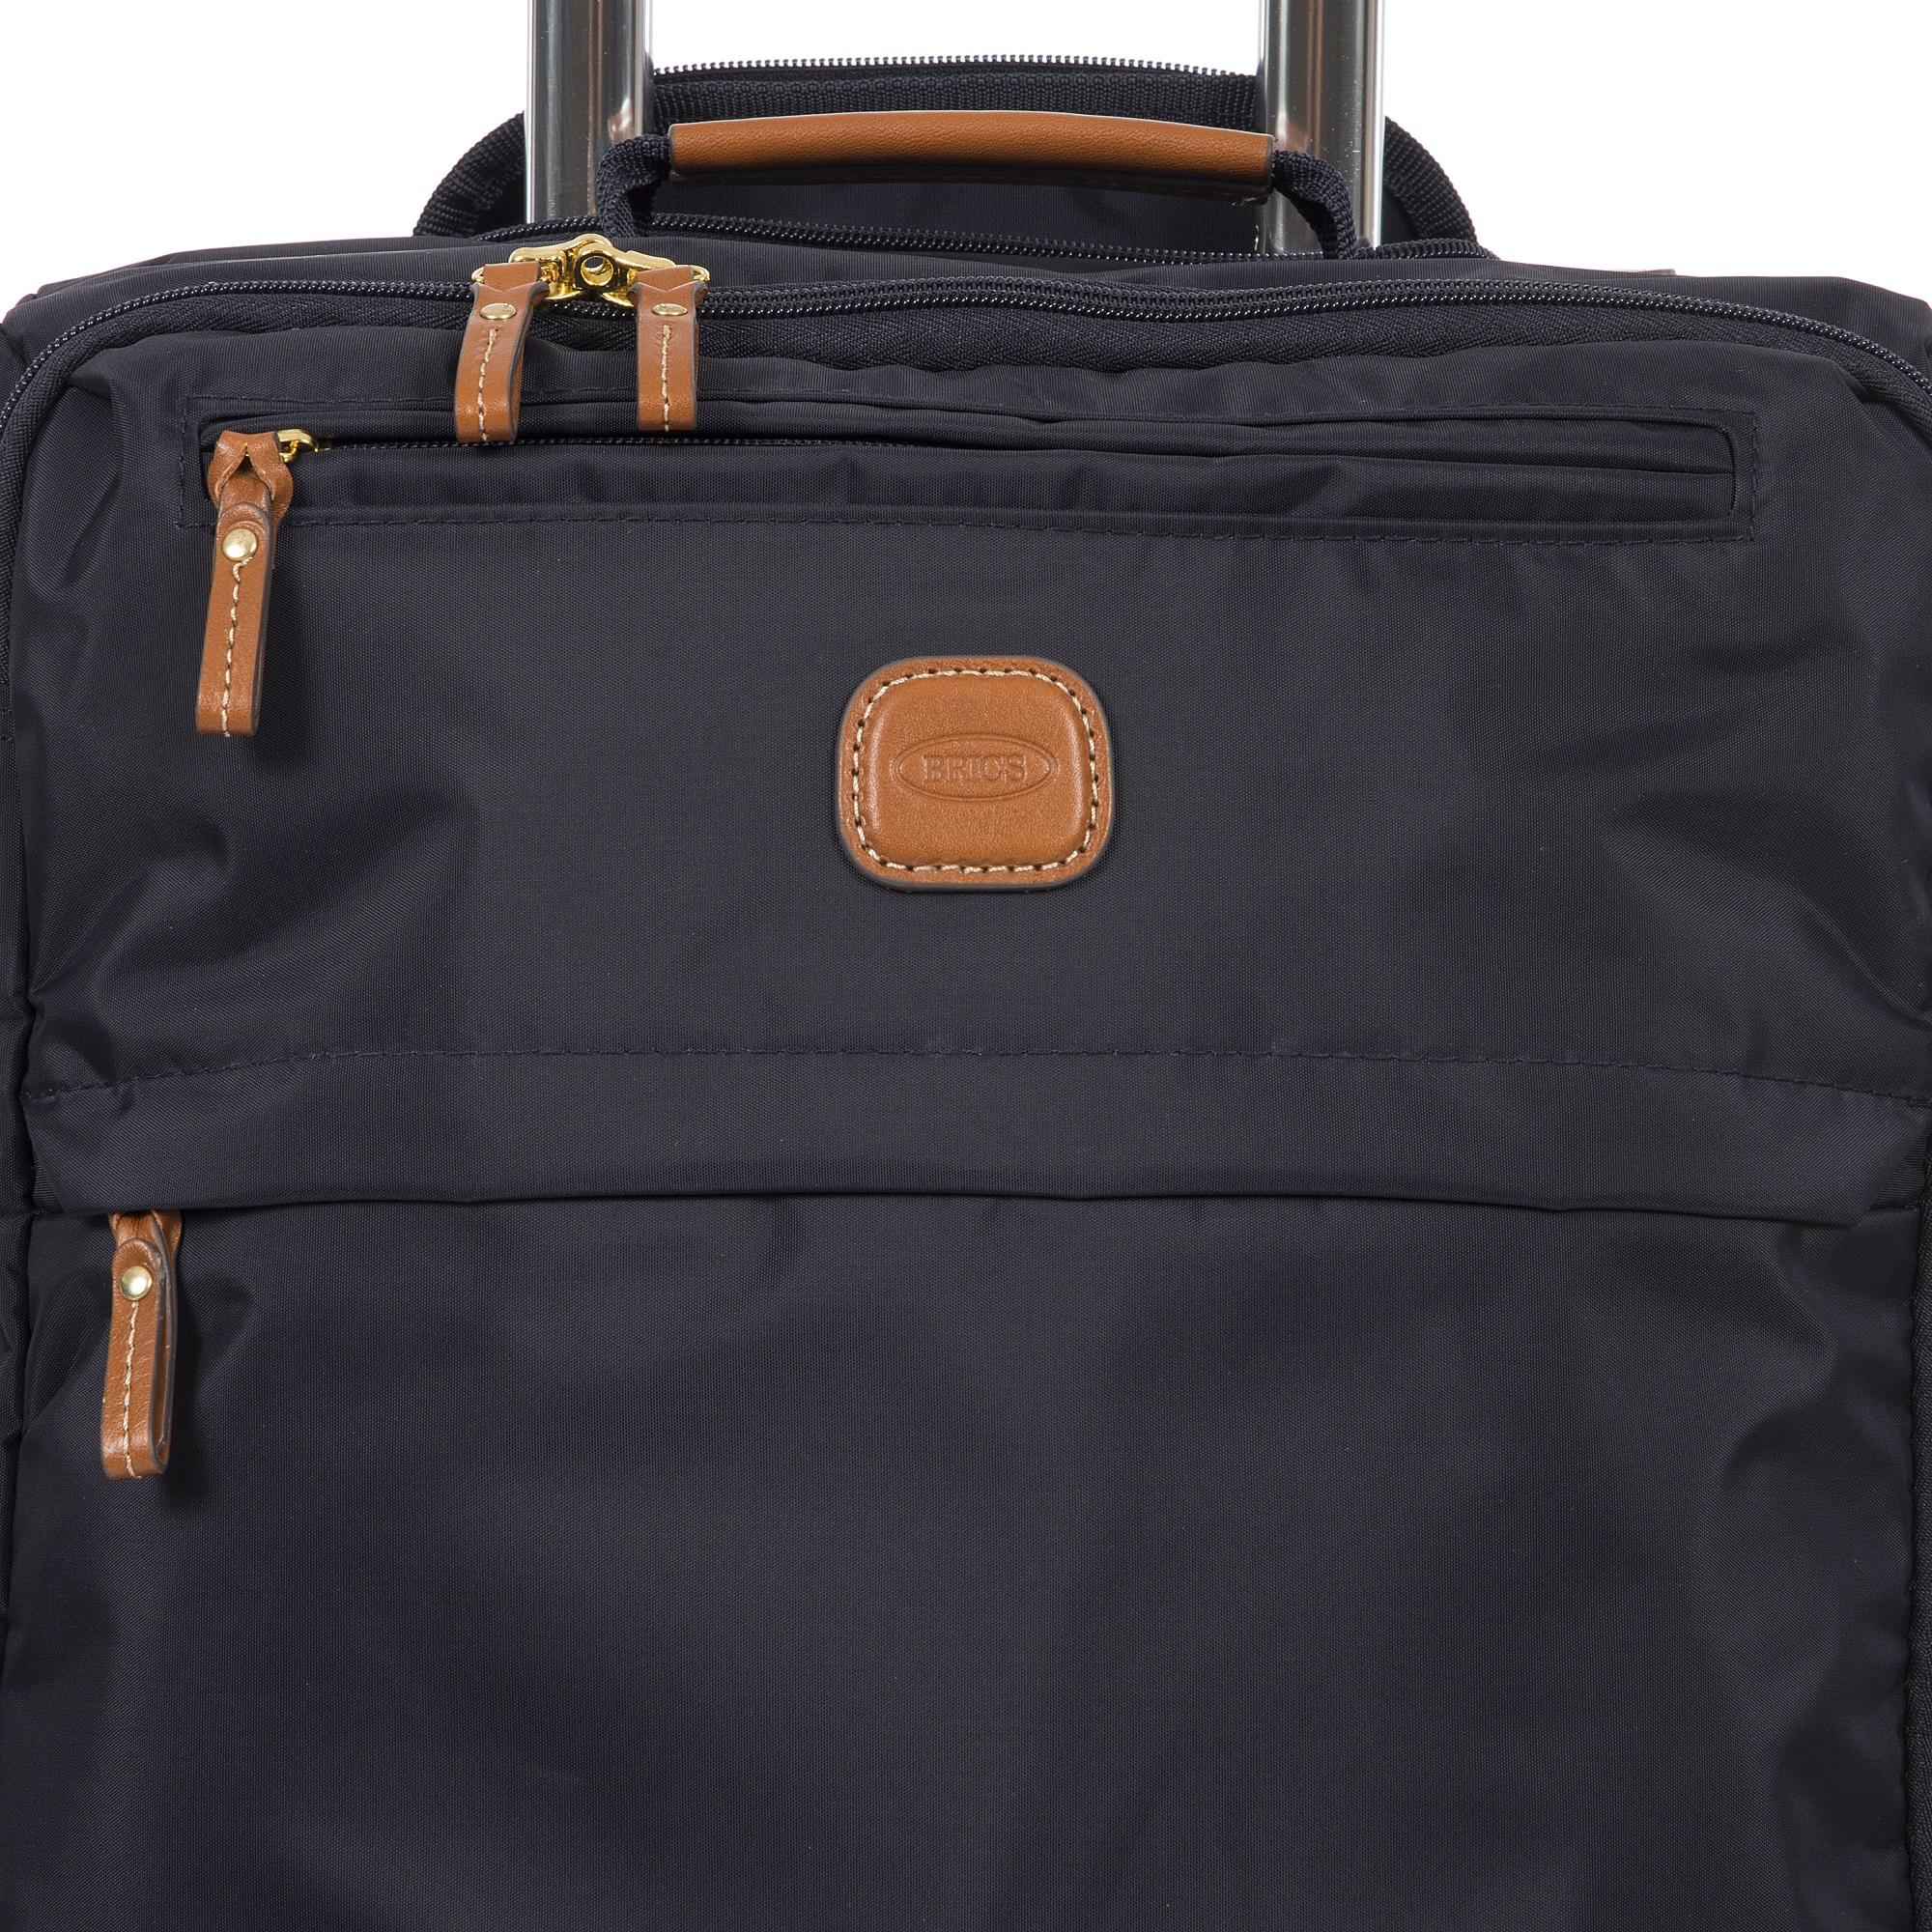 Dove Grey Brics X-Bag//x-Travel 21 Inch International Carry On Spinner W//Frame